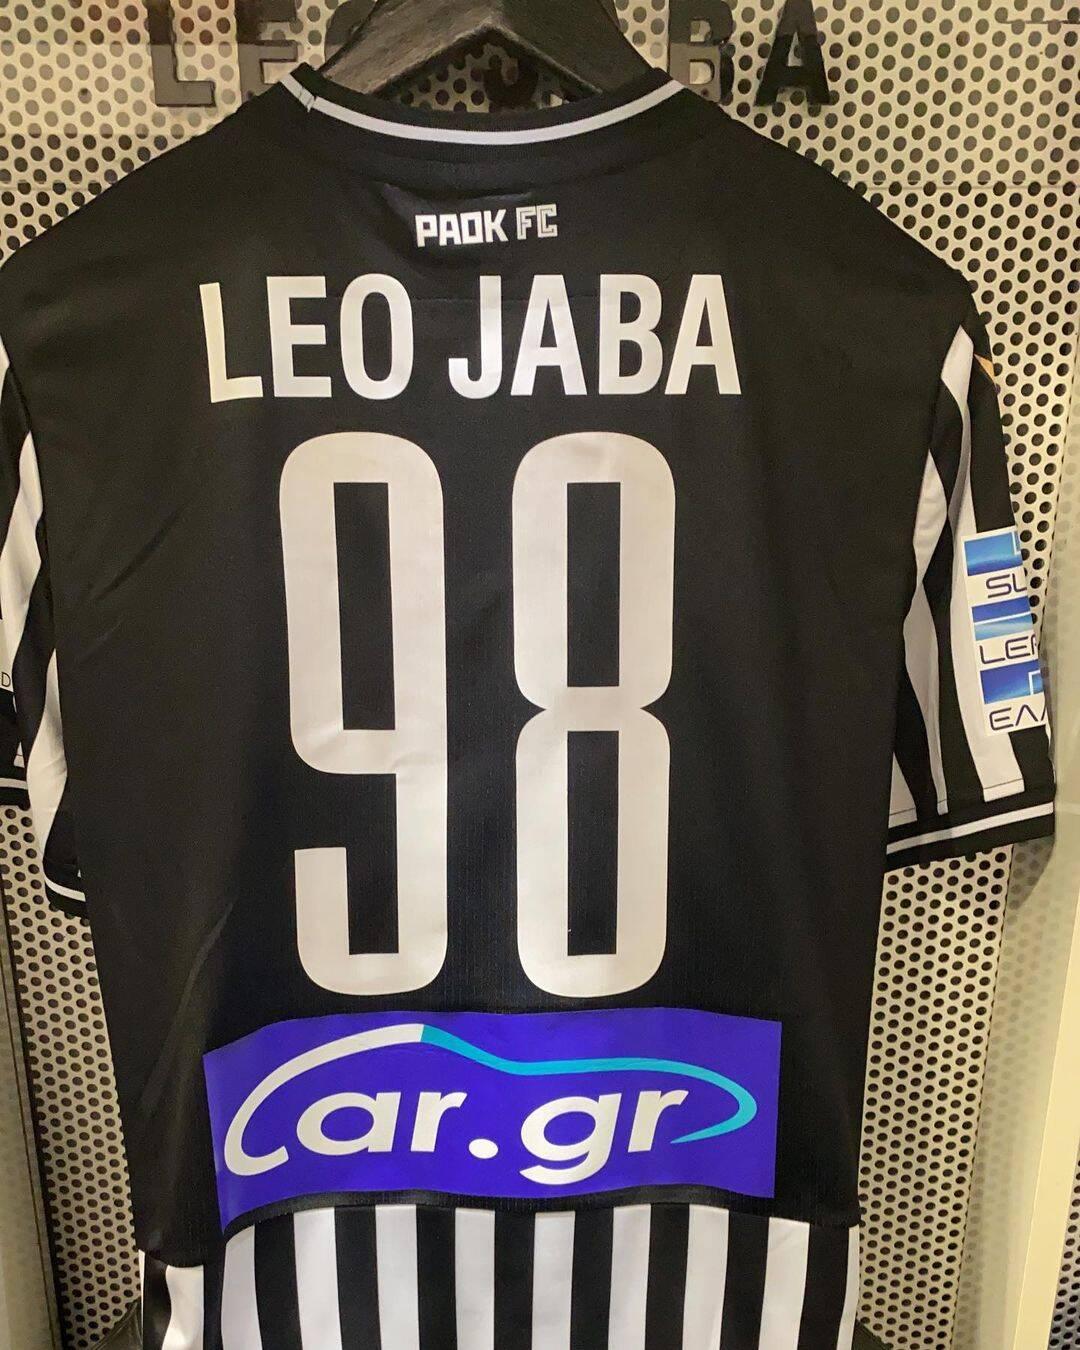 Foto: Instagram/Léo Jabá